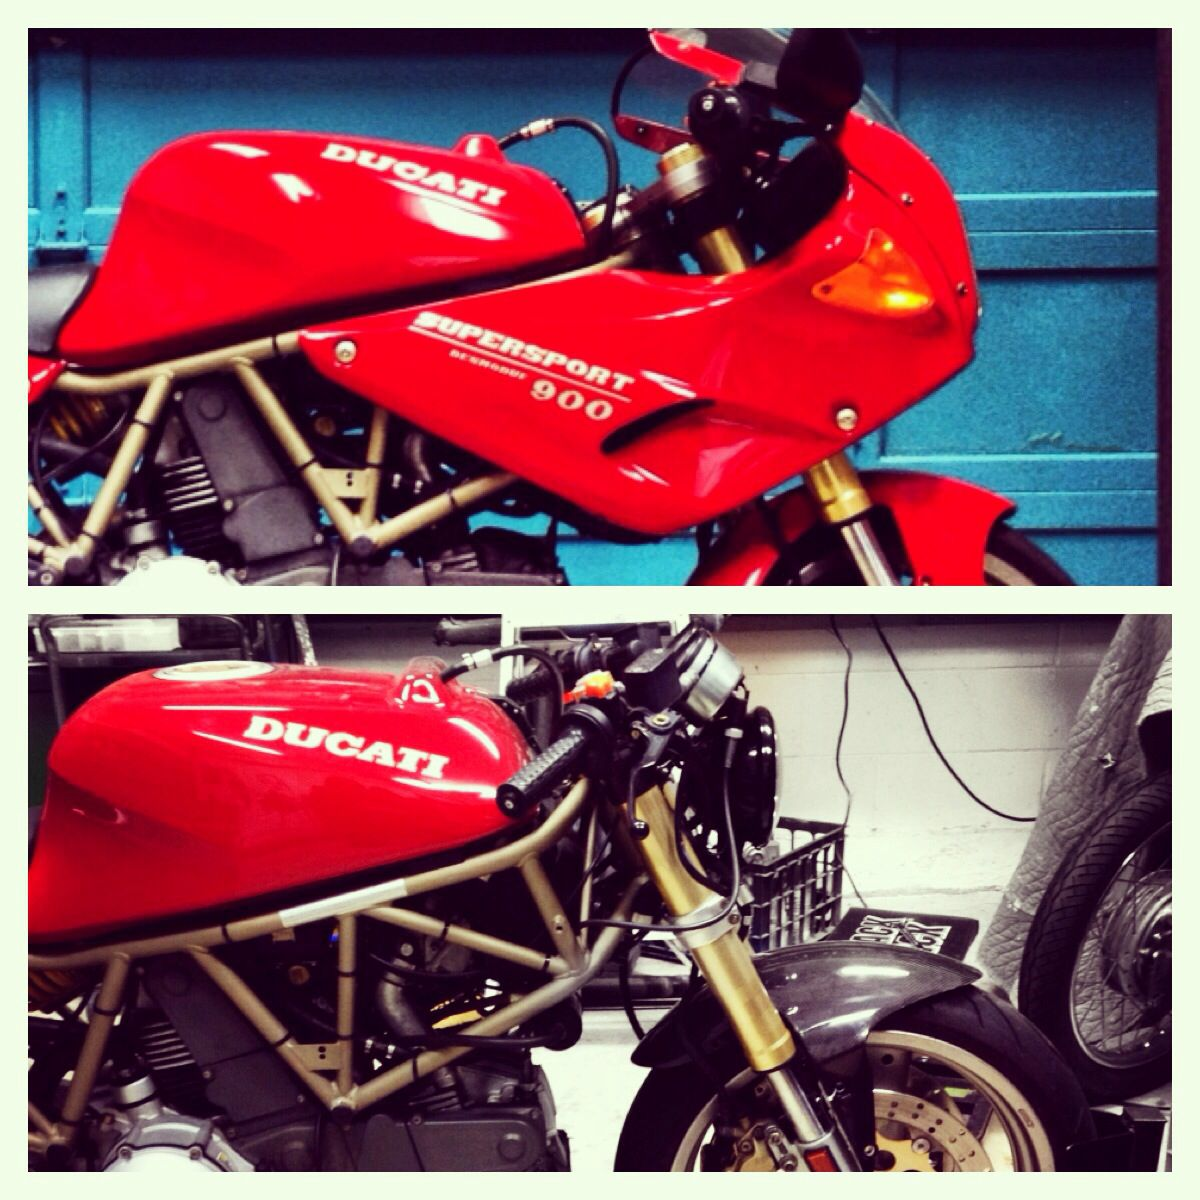 Comparison Of The Front End Conversion Cafe Racer Ducati Super